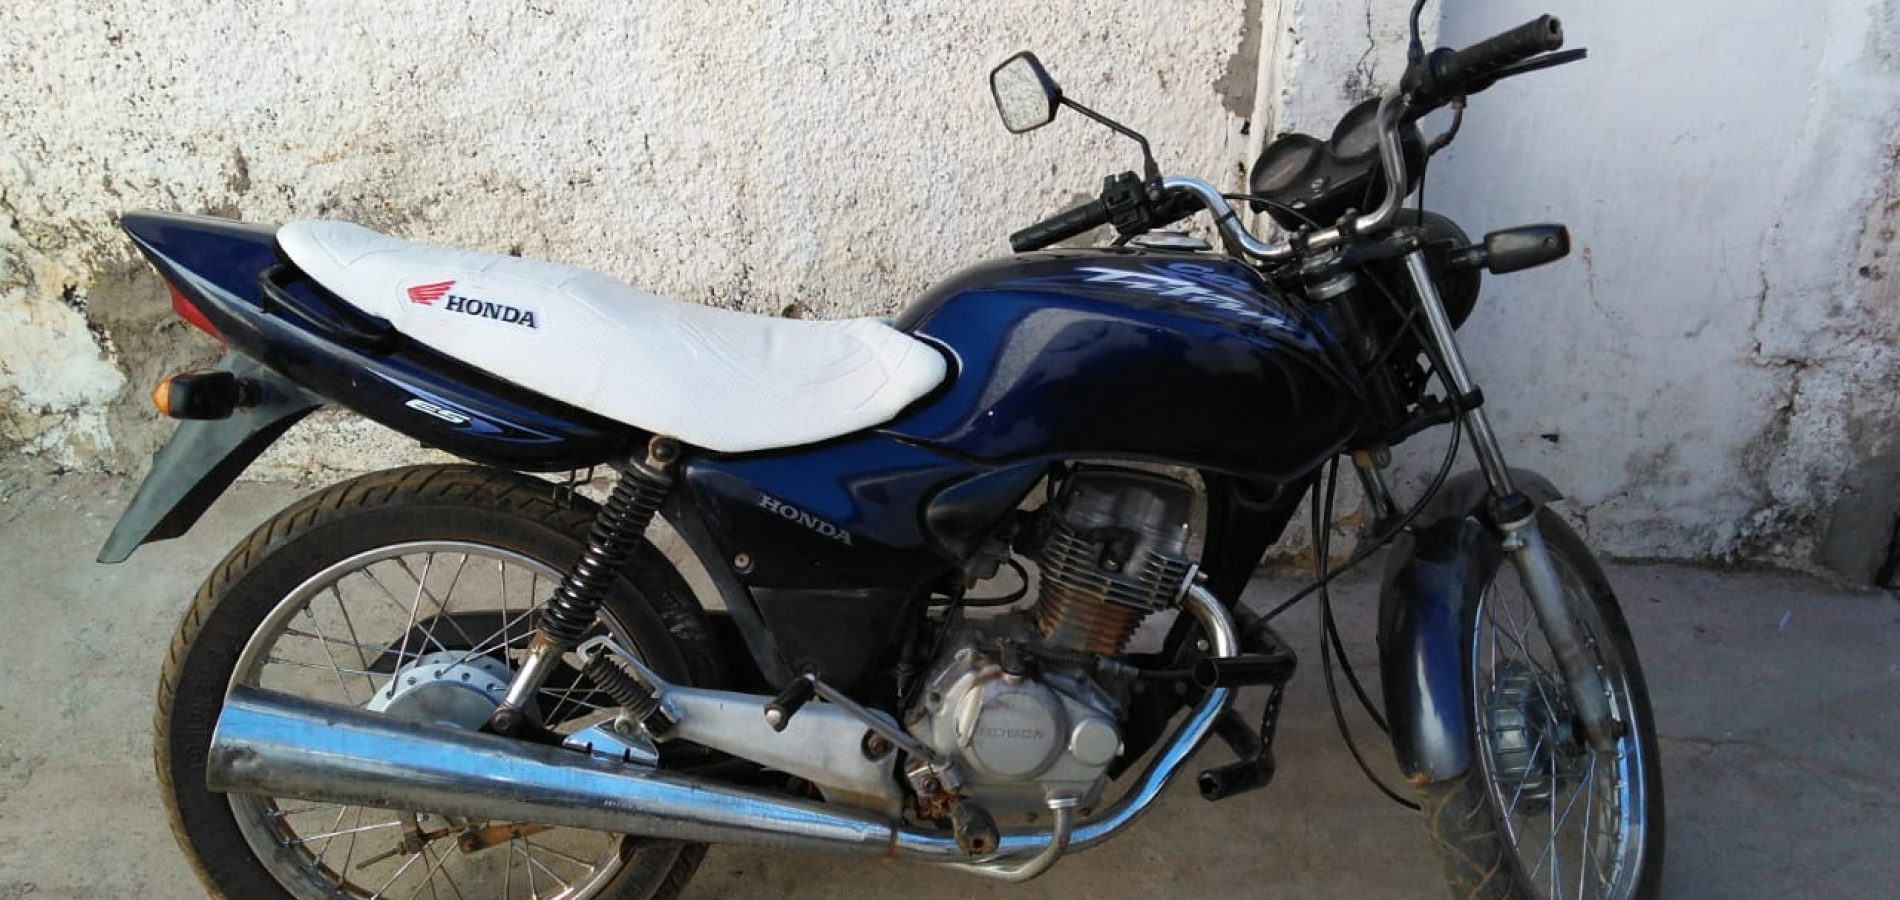 Força Tática de Paulistana recupera motocicleta roubada na Bahia